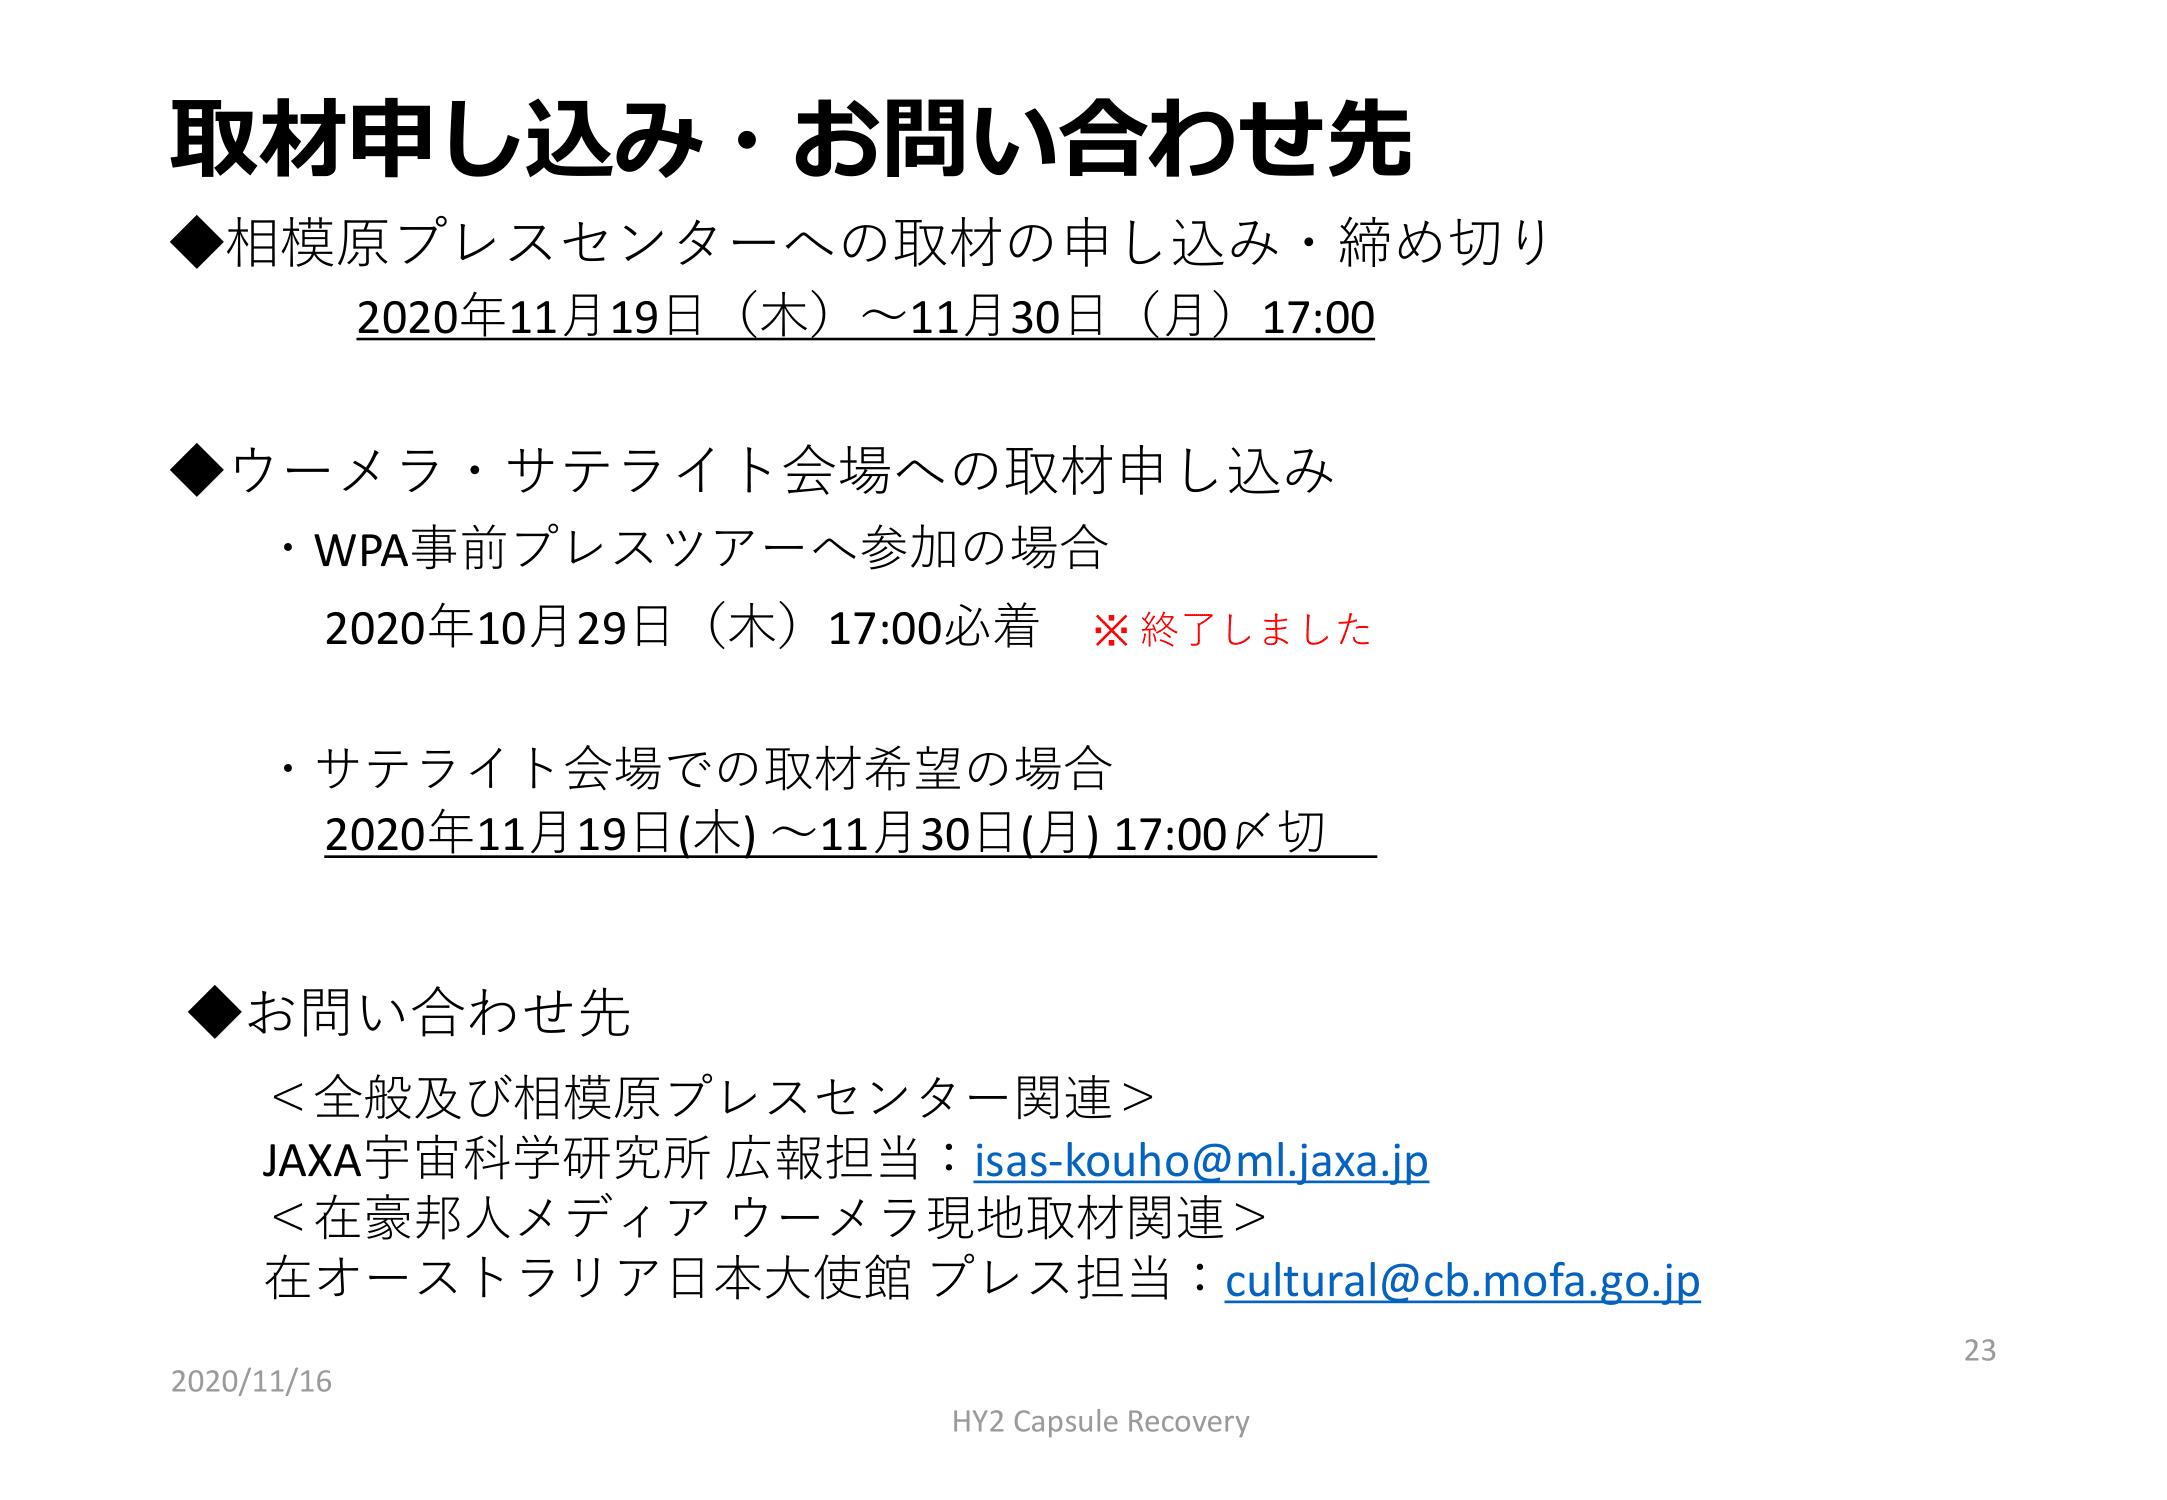 f:id:Imamura:20201117222451p:plain